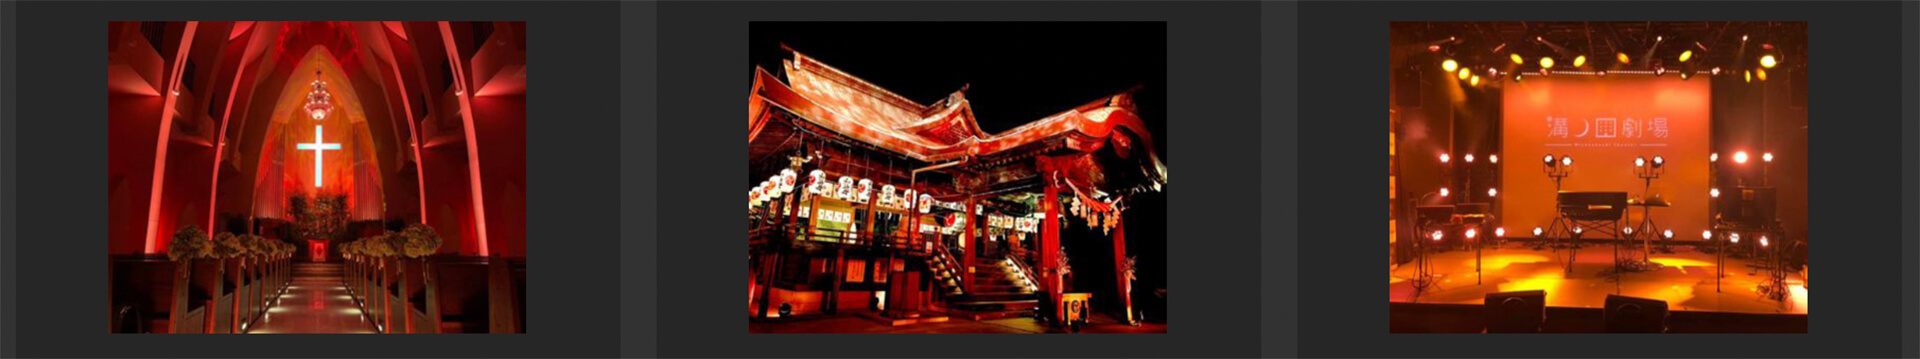 JAPAN#31PROJECT 日本橋三越本店と銀座三越のライオン像